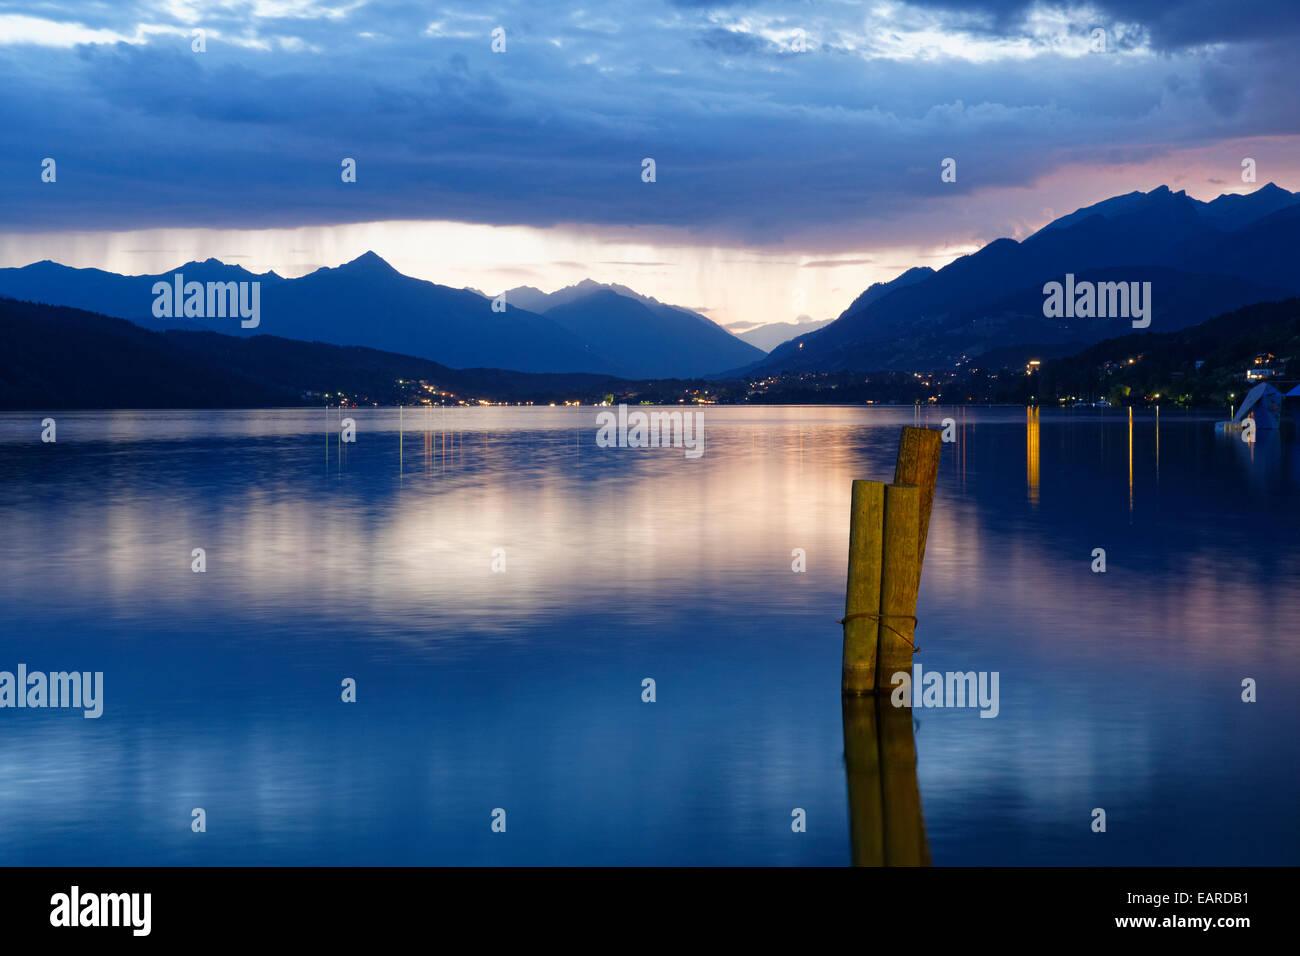 Lake Millstatt, evening mood, Millstatt am See, Spittal an der Drau, Carinthia, Austria - Stock Image